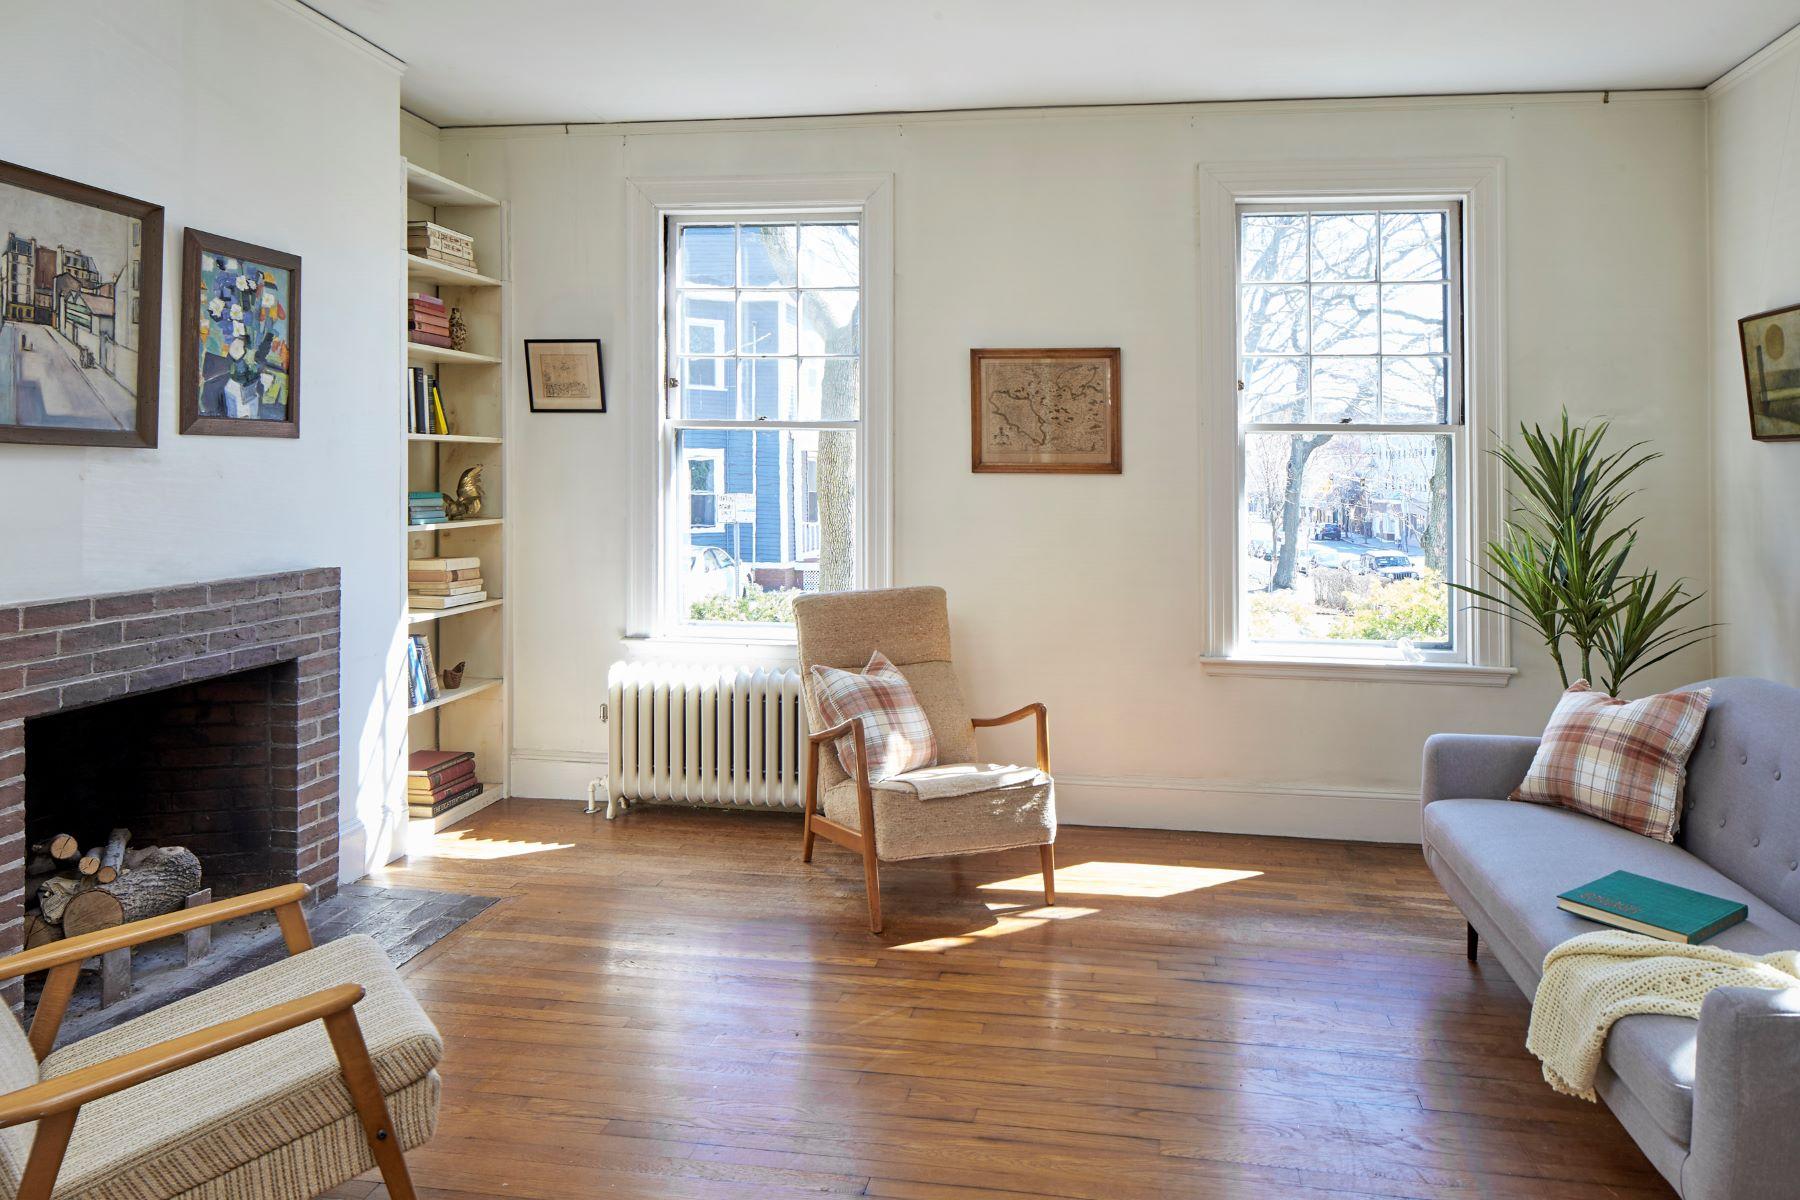 Single Family Homes για την Πώληση στο Cambridge, Μασαχουσετη 02139 Ηνωμένες Πολιτείες